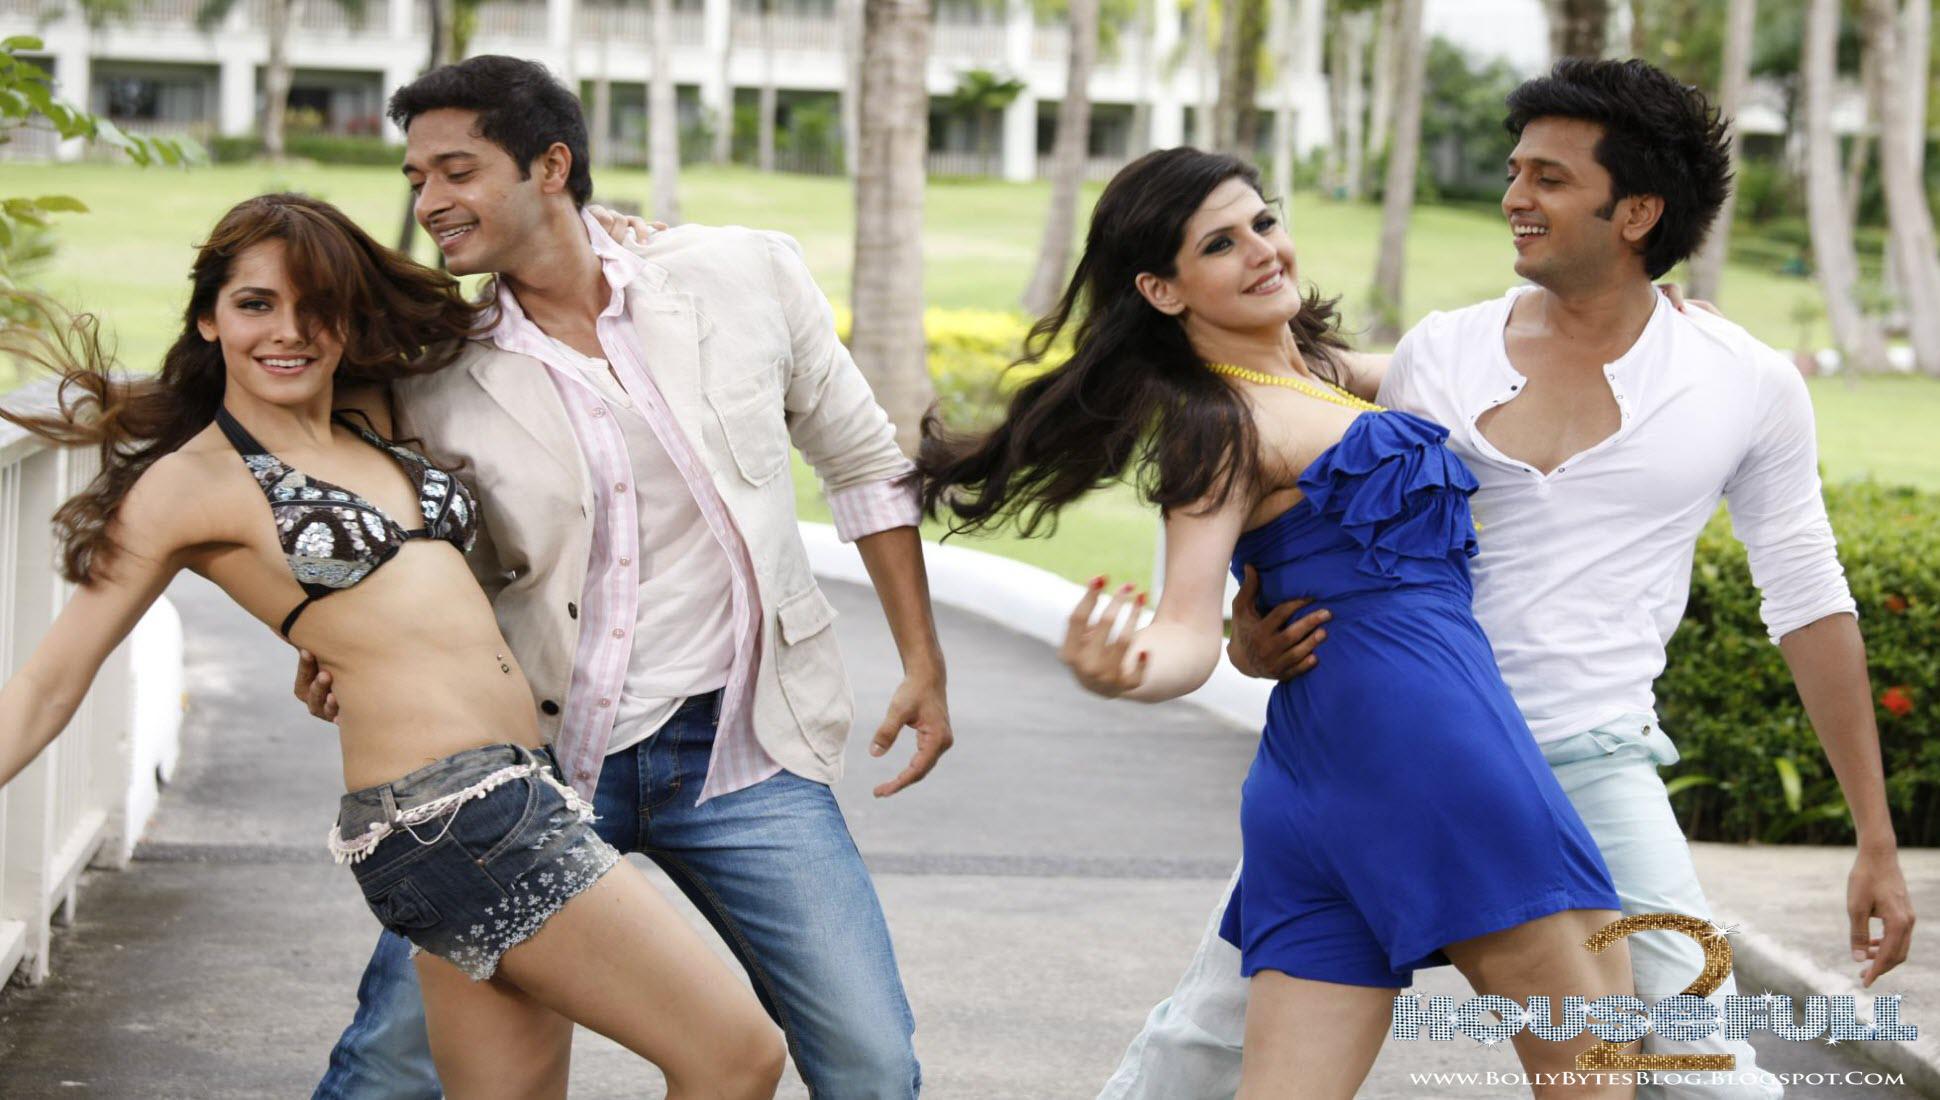 http://1.bp.blogspot.com/-jFswxQqSUs0/T3Vvgp2fh5I/AAAAAAAAFQw/THVi1gkXbgo/s1940/Housefull-2-Ritesh-Deshmukh-+Shreyas-Talpade-Zarine-Khan-Shahzan-Padamsee-HQ-Wallpapers-07.jpg